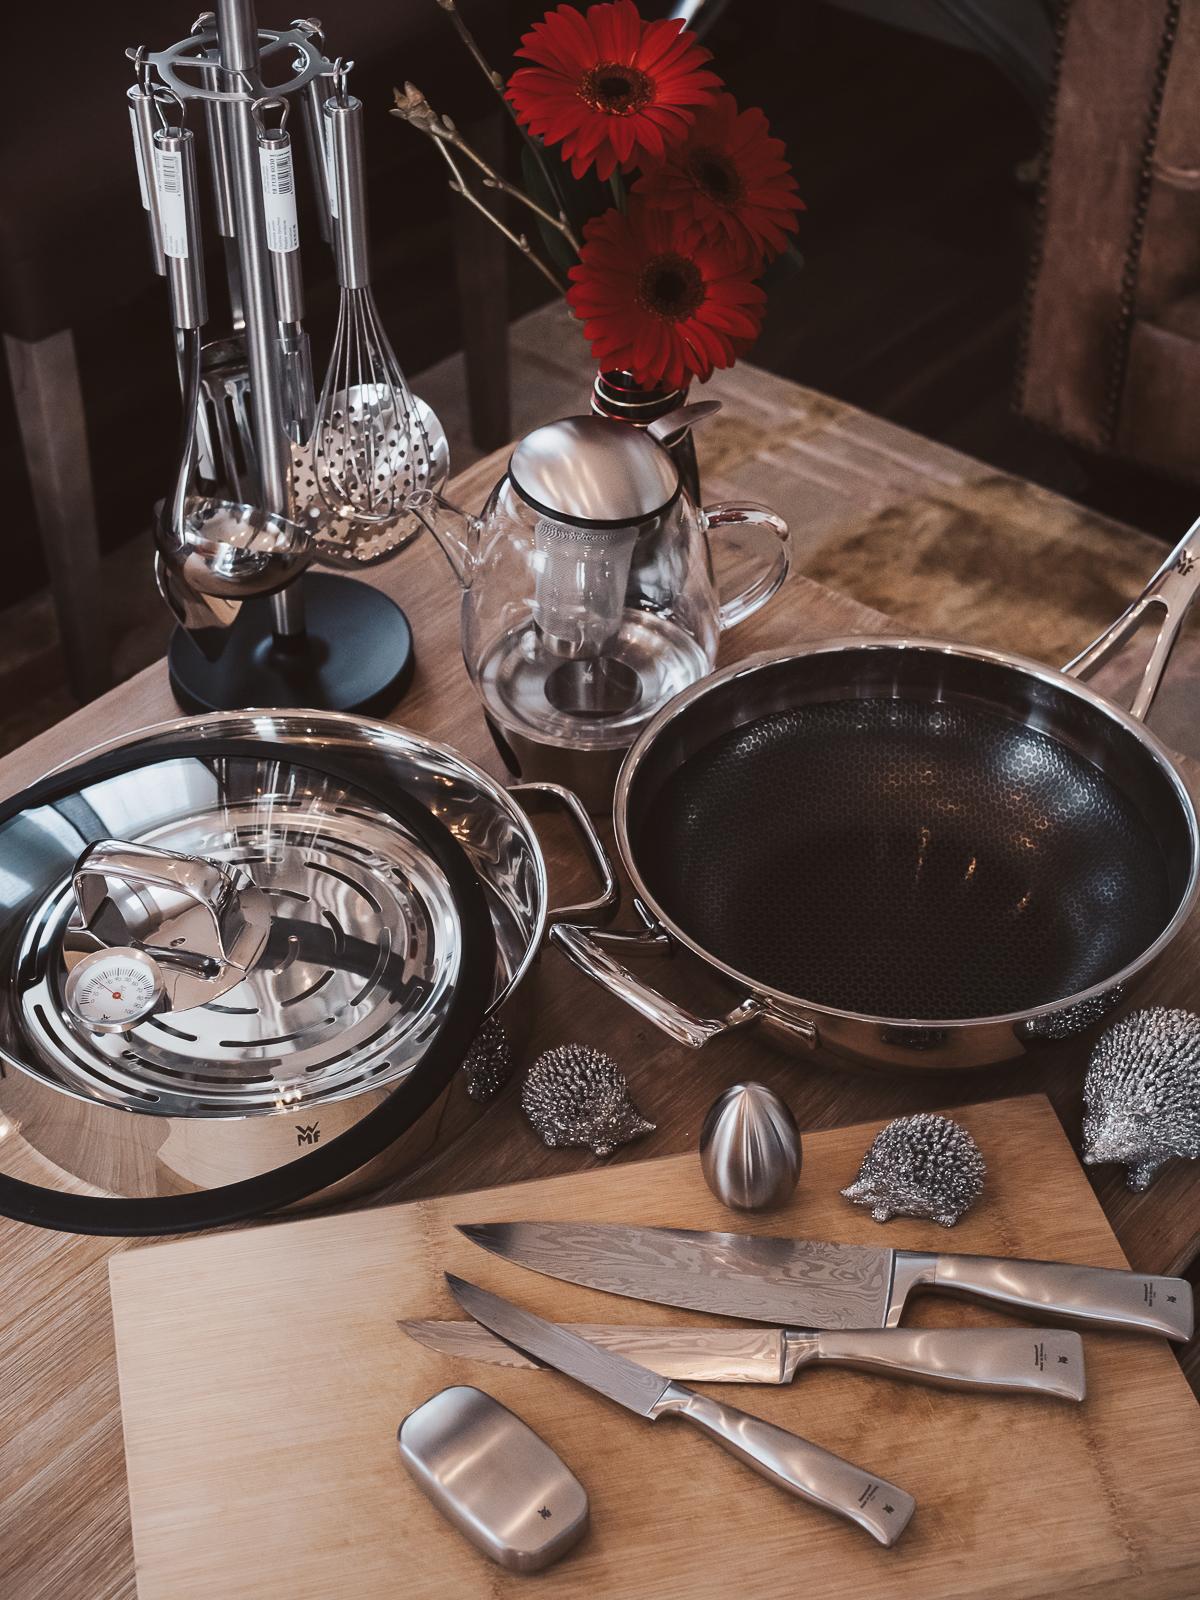 Ingolstadt Village Chinese New Year Lifestyle Shopping & Home Cooking - Olympus EM1Markii 2512 - Yes! Please Enjoy by Fanning Tseng-63.jpg